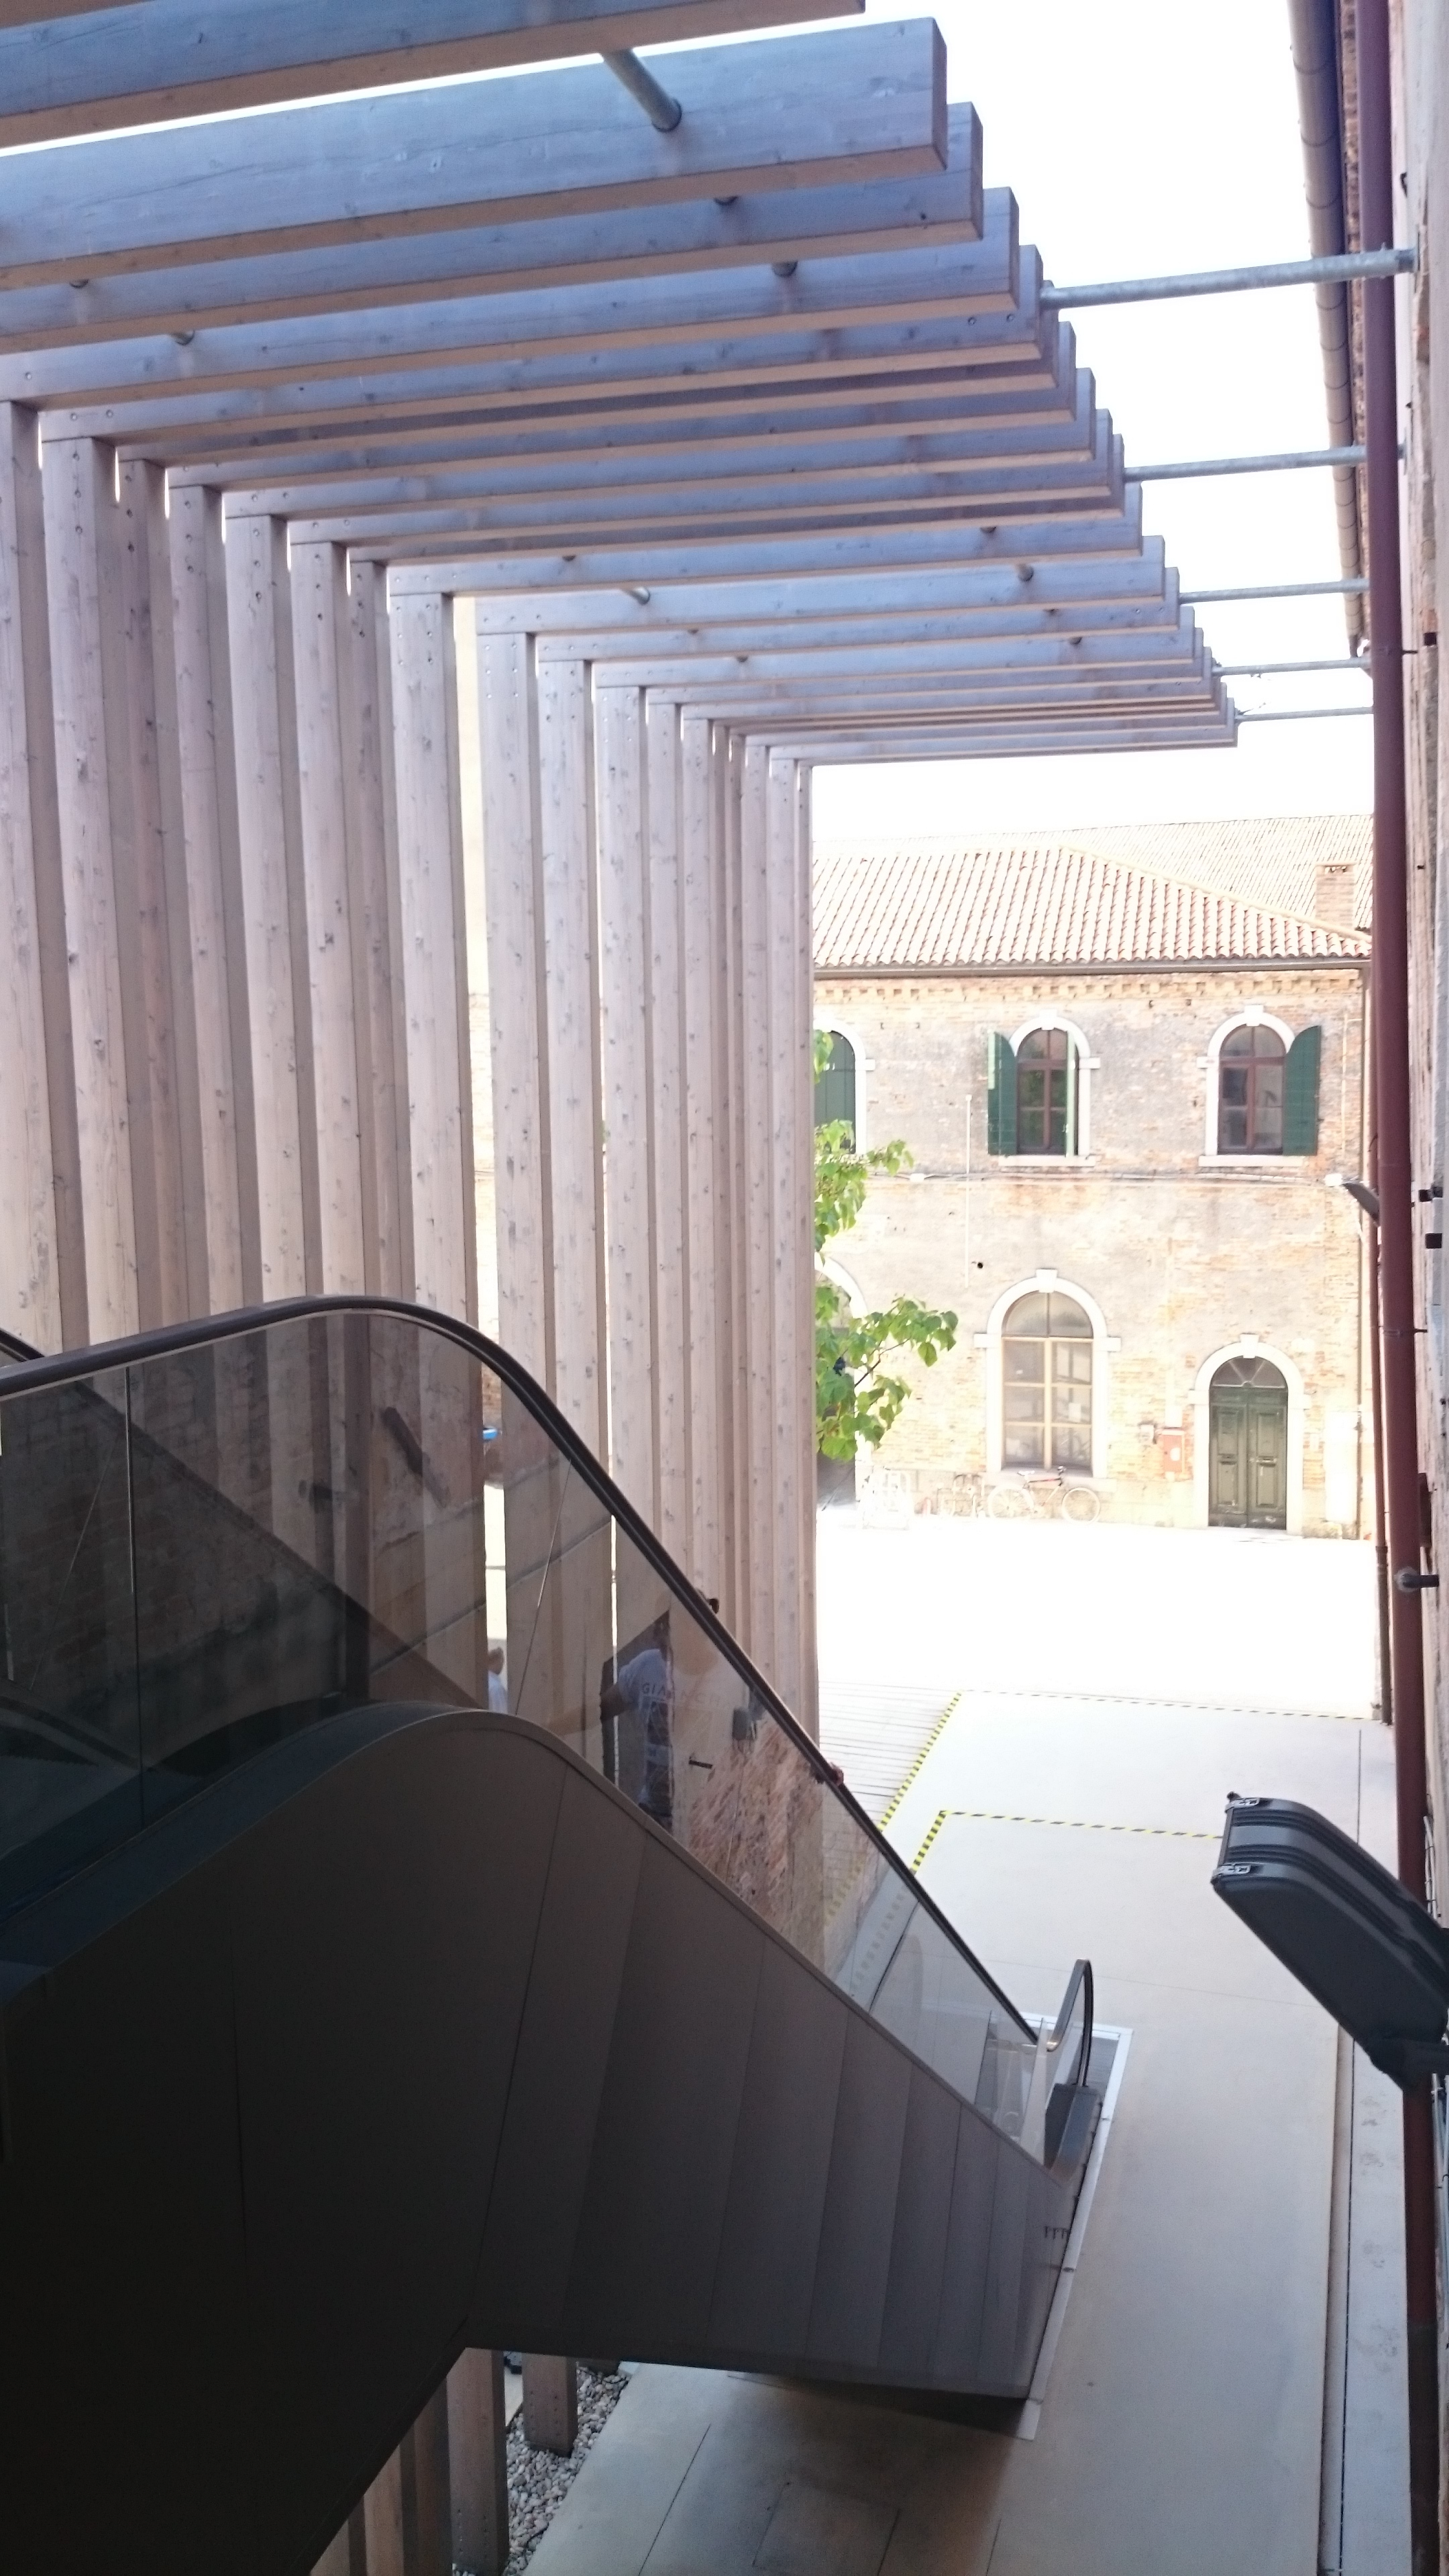 Exterior escalator